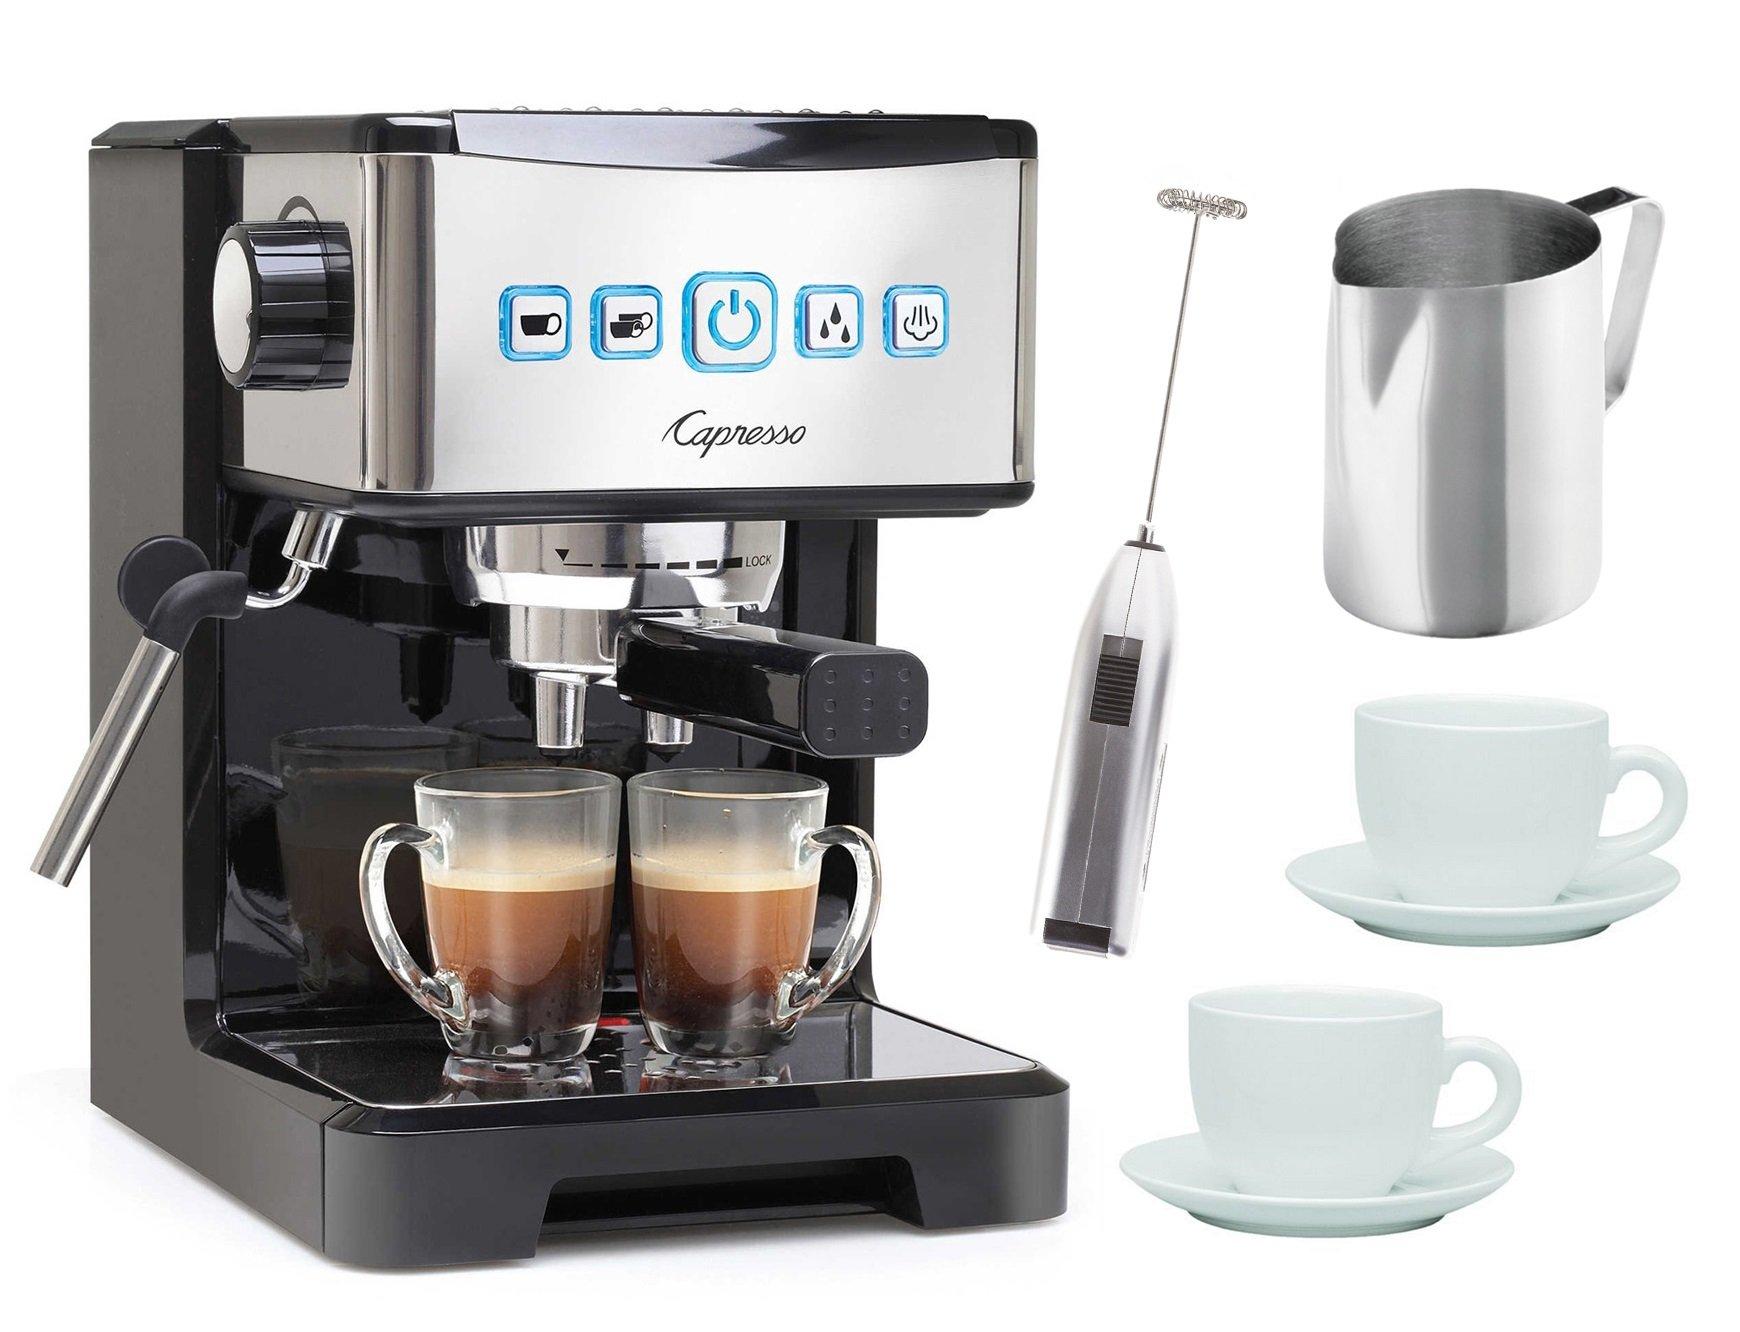 Capresso Ultima PRO Programmable Espresso & Cappuccino Maker Bundle (Certified Refurbished) by Capresso (Image #1)